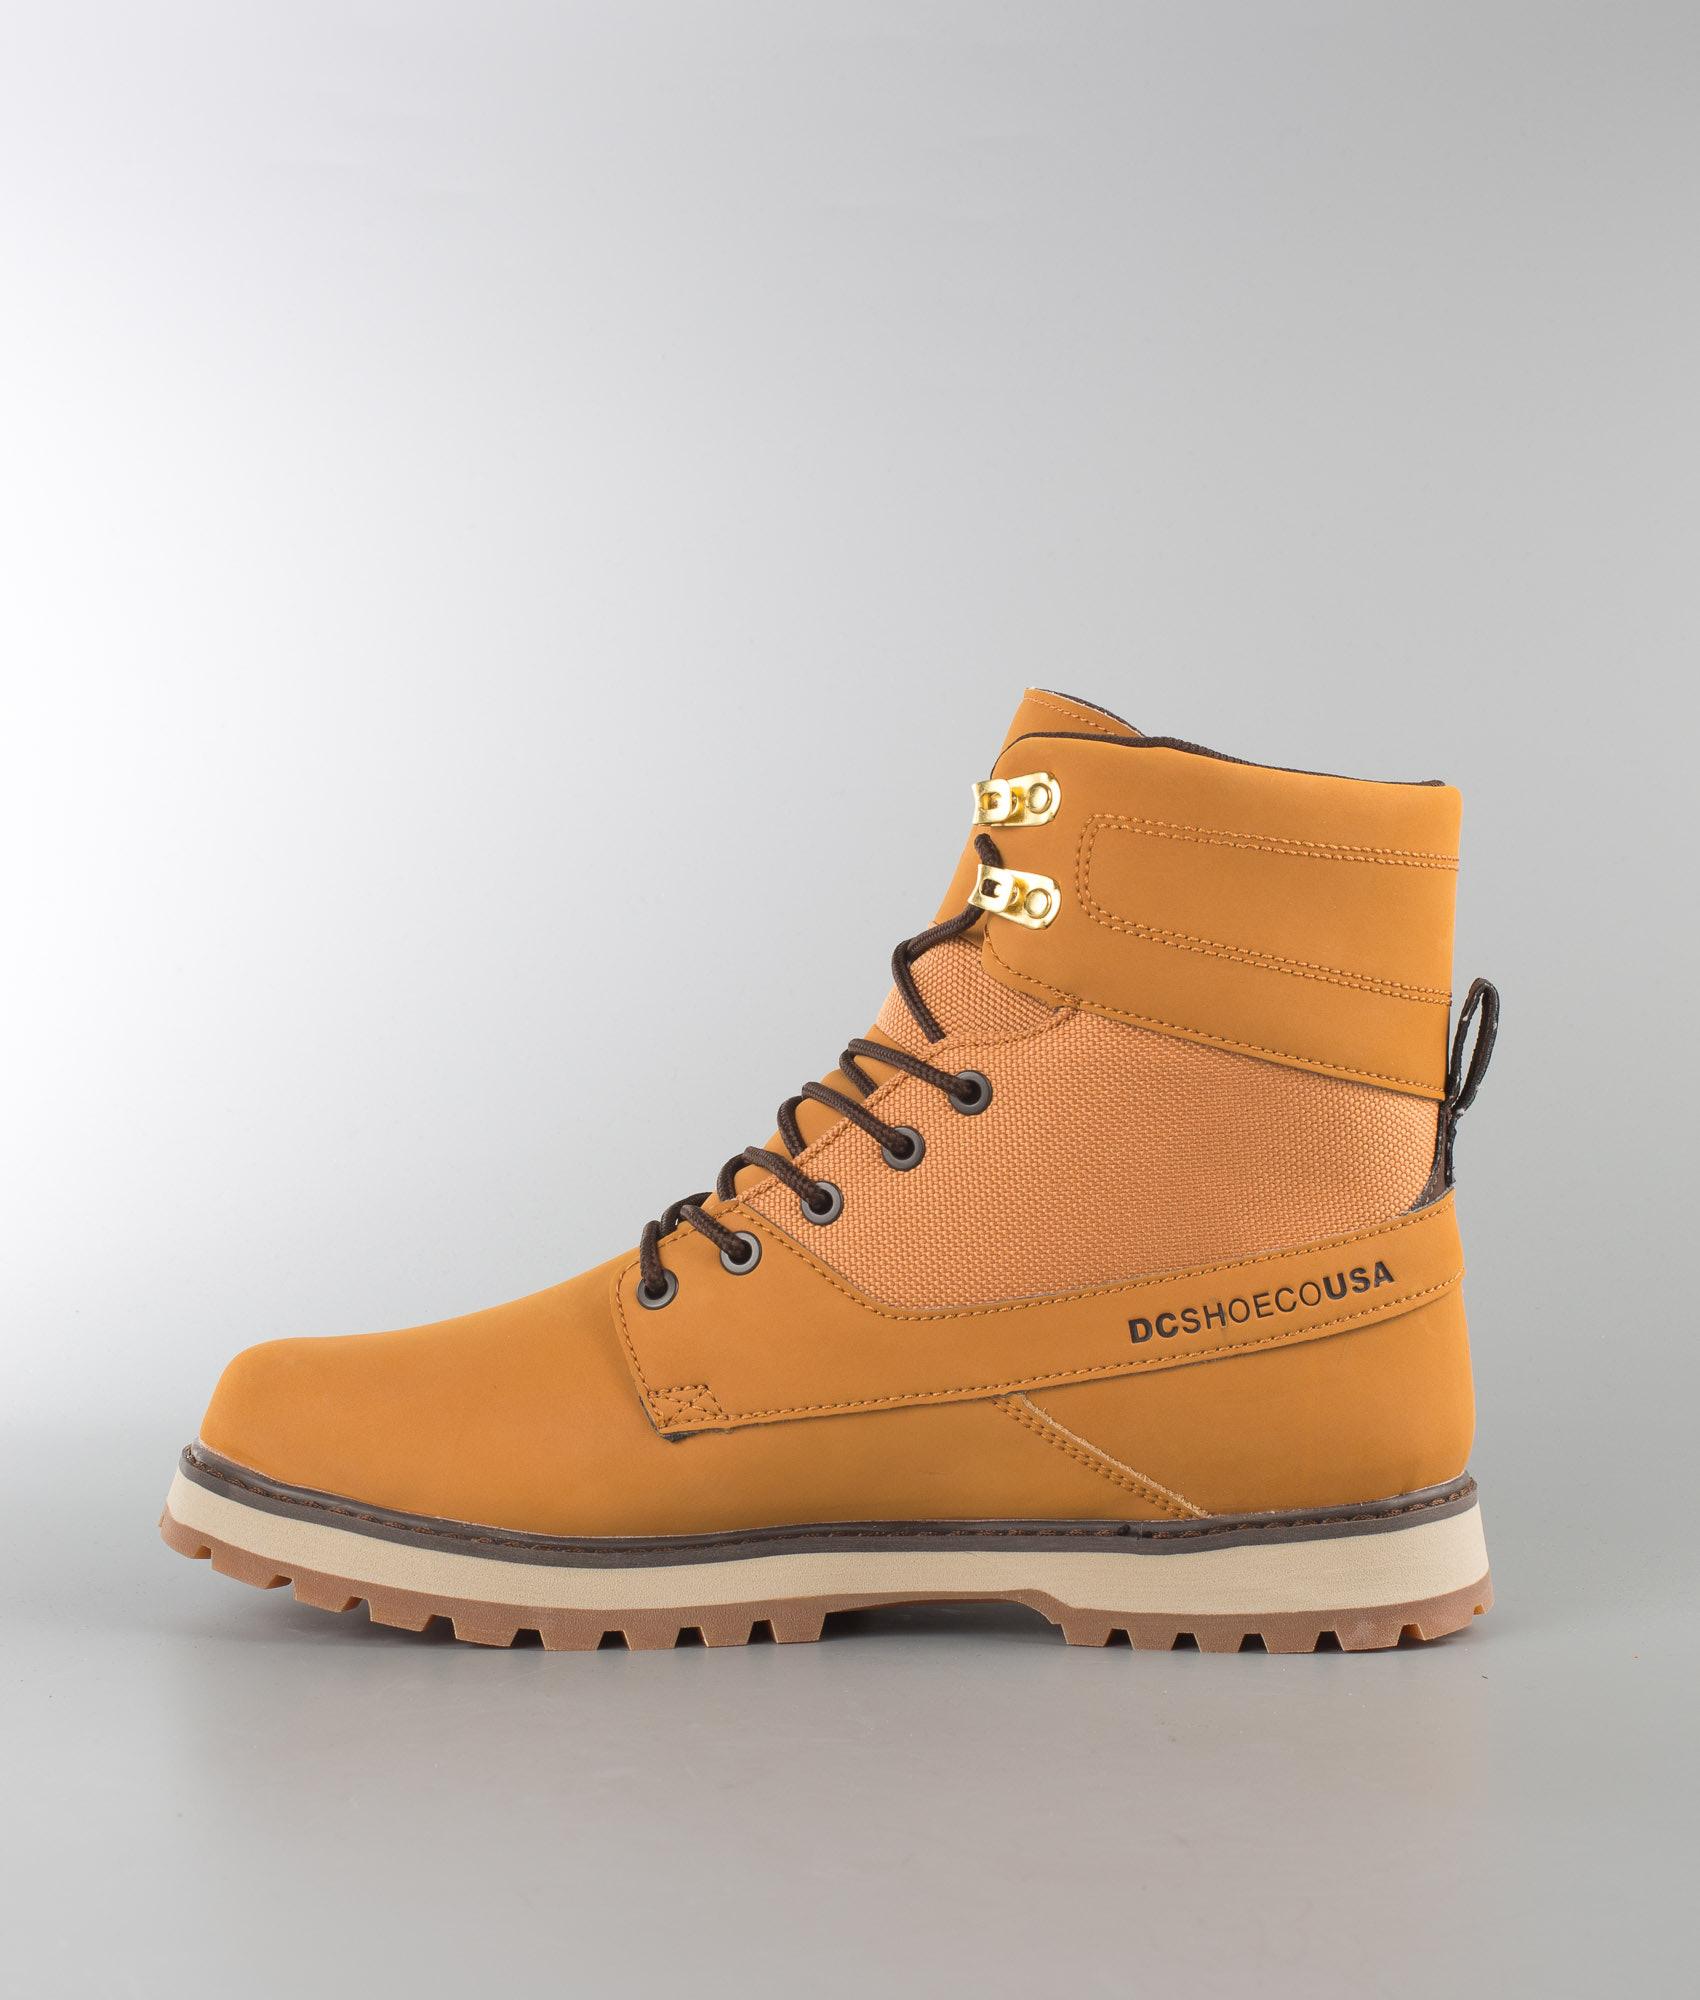 DC Uncas Shoes Wheat Black Dk Chocolate - Ridestore.com 386b927481b